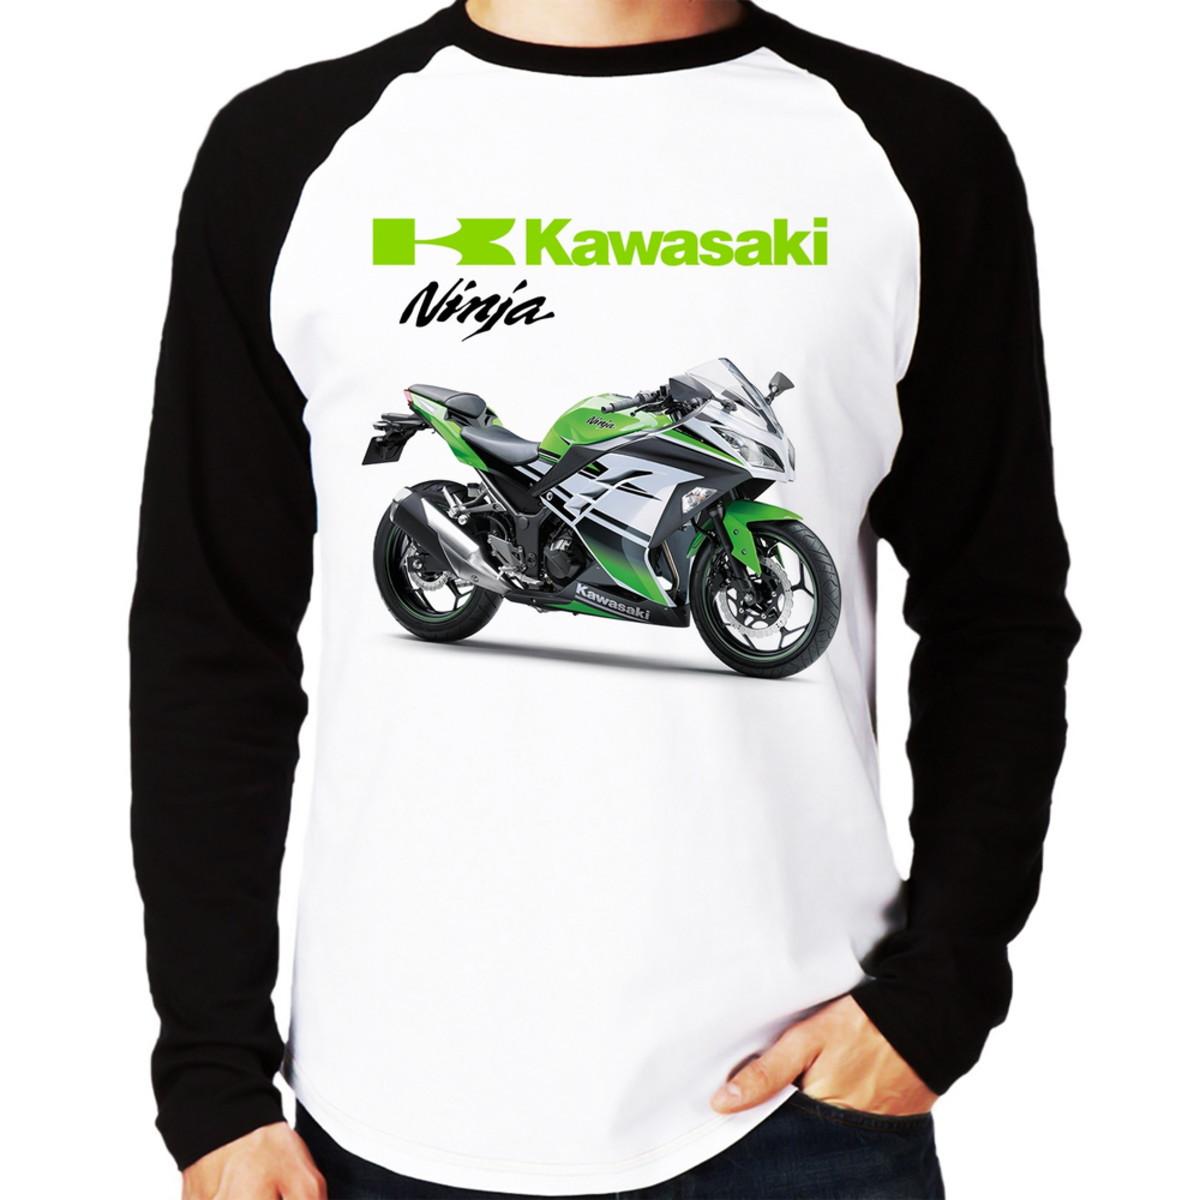 Camiseta Moto Kawasaki Ninja 300 Verde Raglan Longa No Elo7 Foca Na Moda D15085